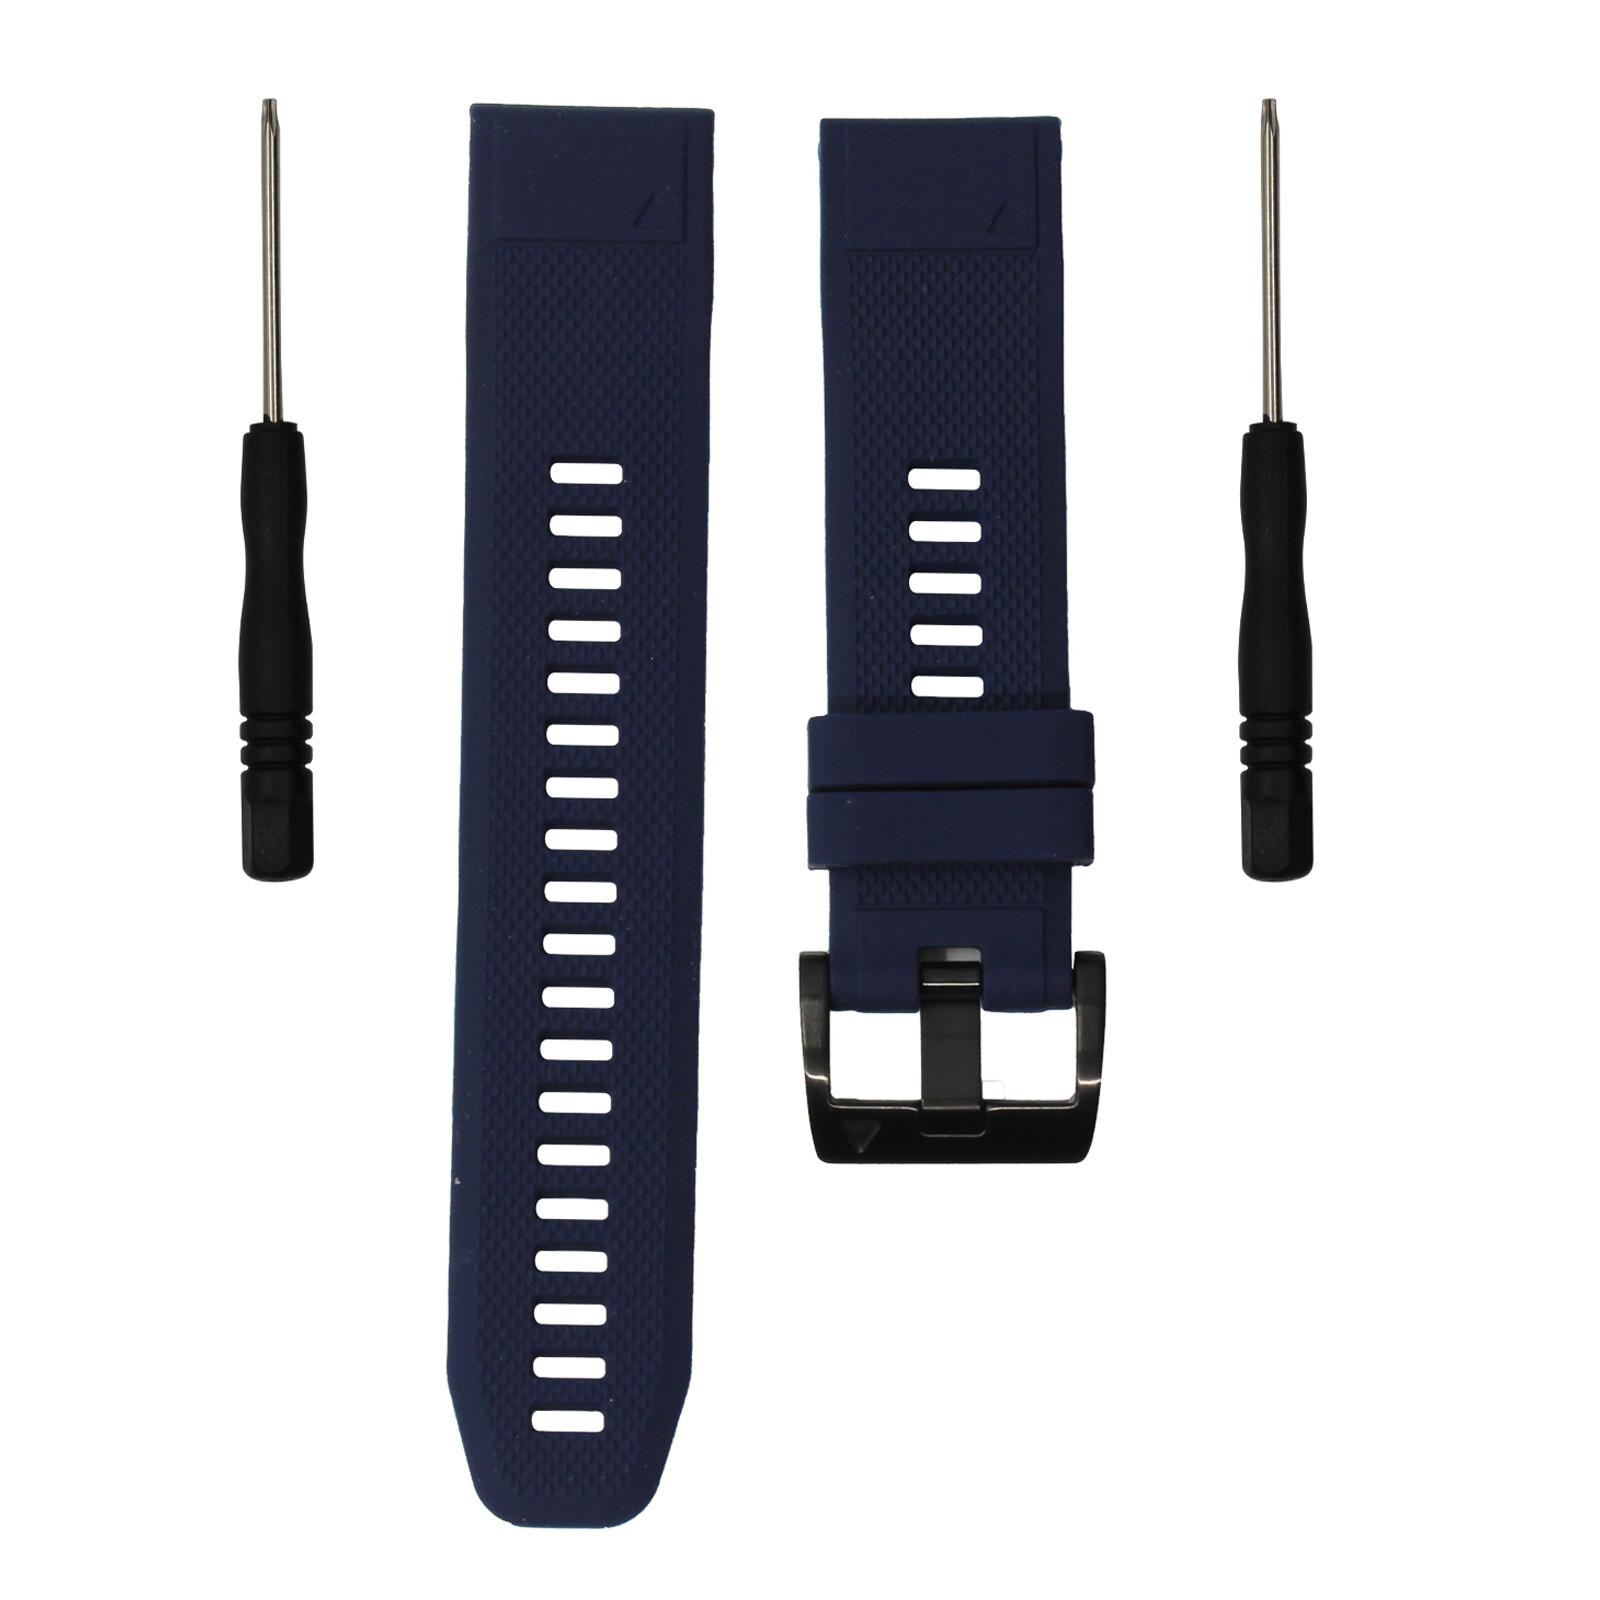 Mika Uhrenarmband Garmin Quick 22mm Silikon dunkelblau